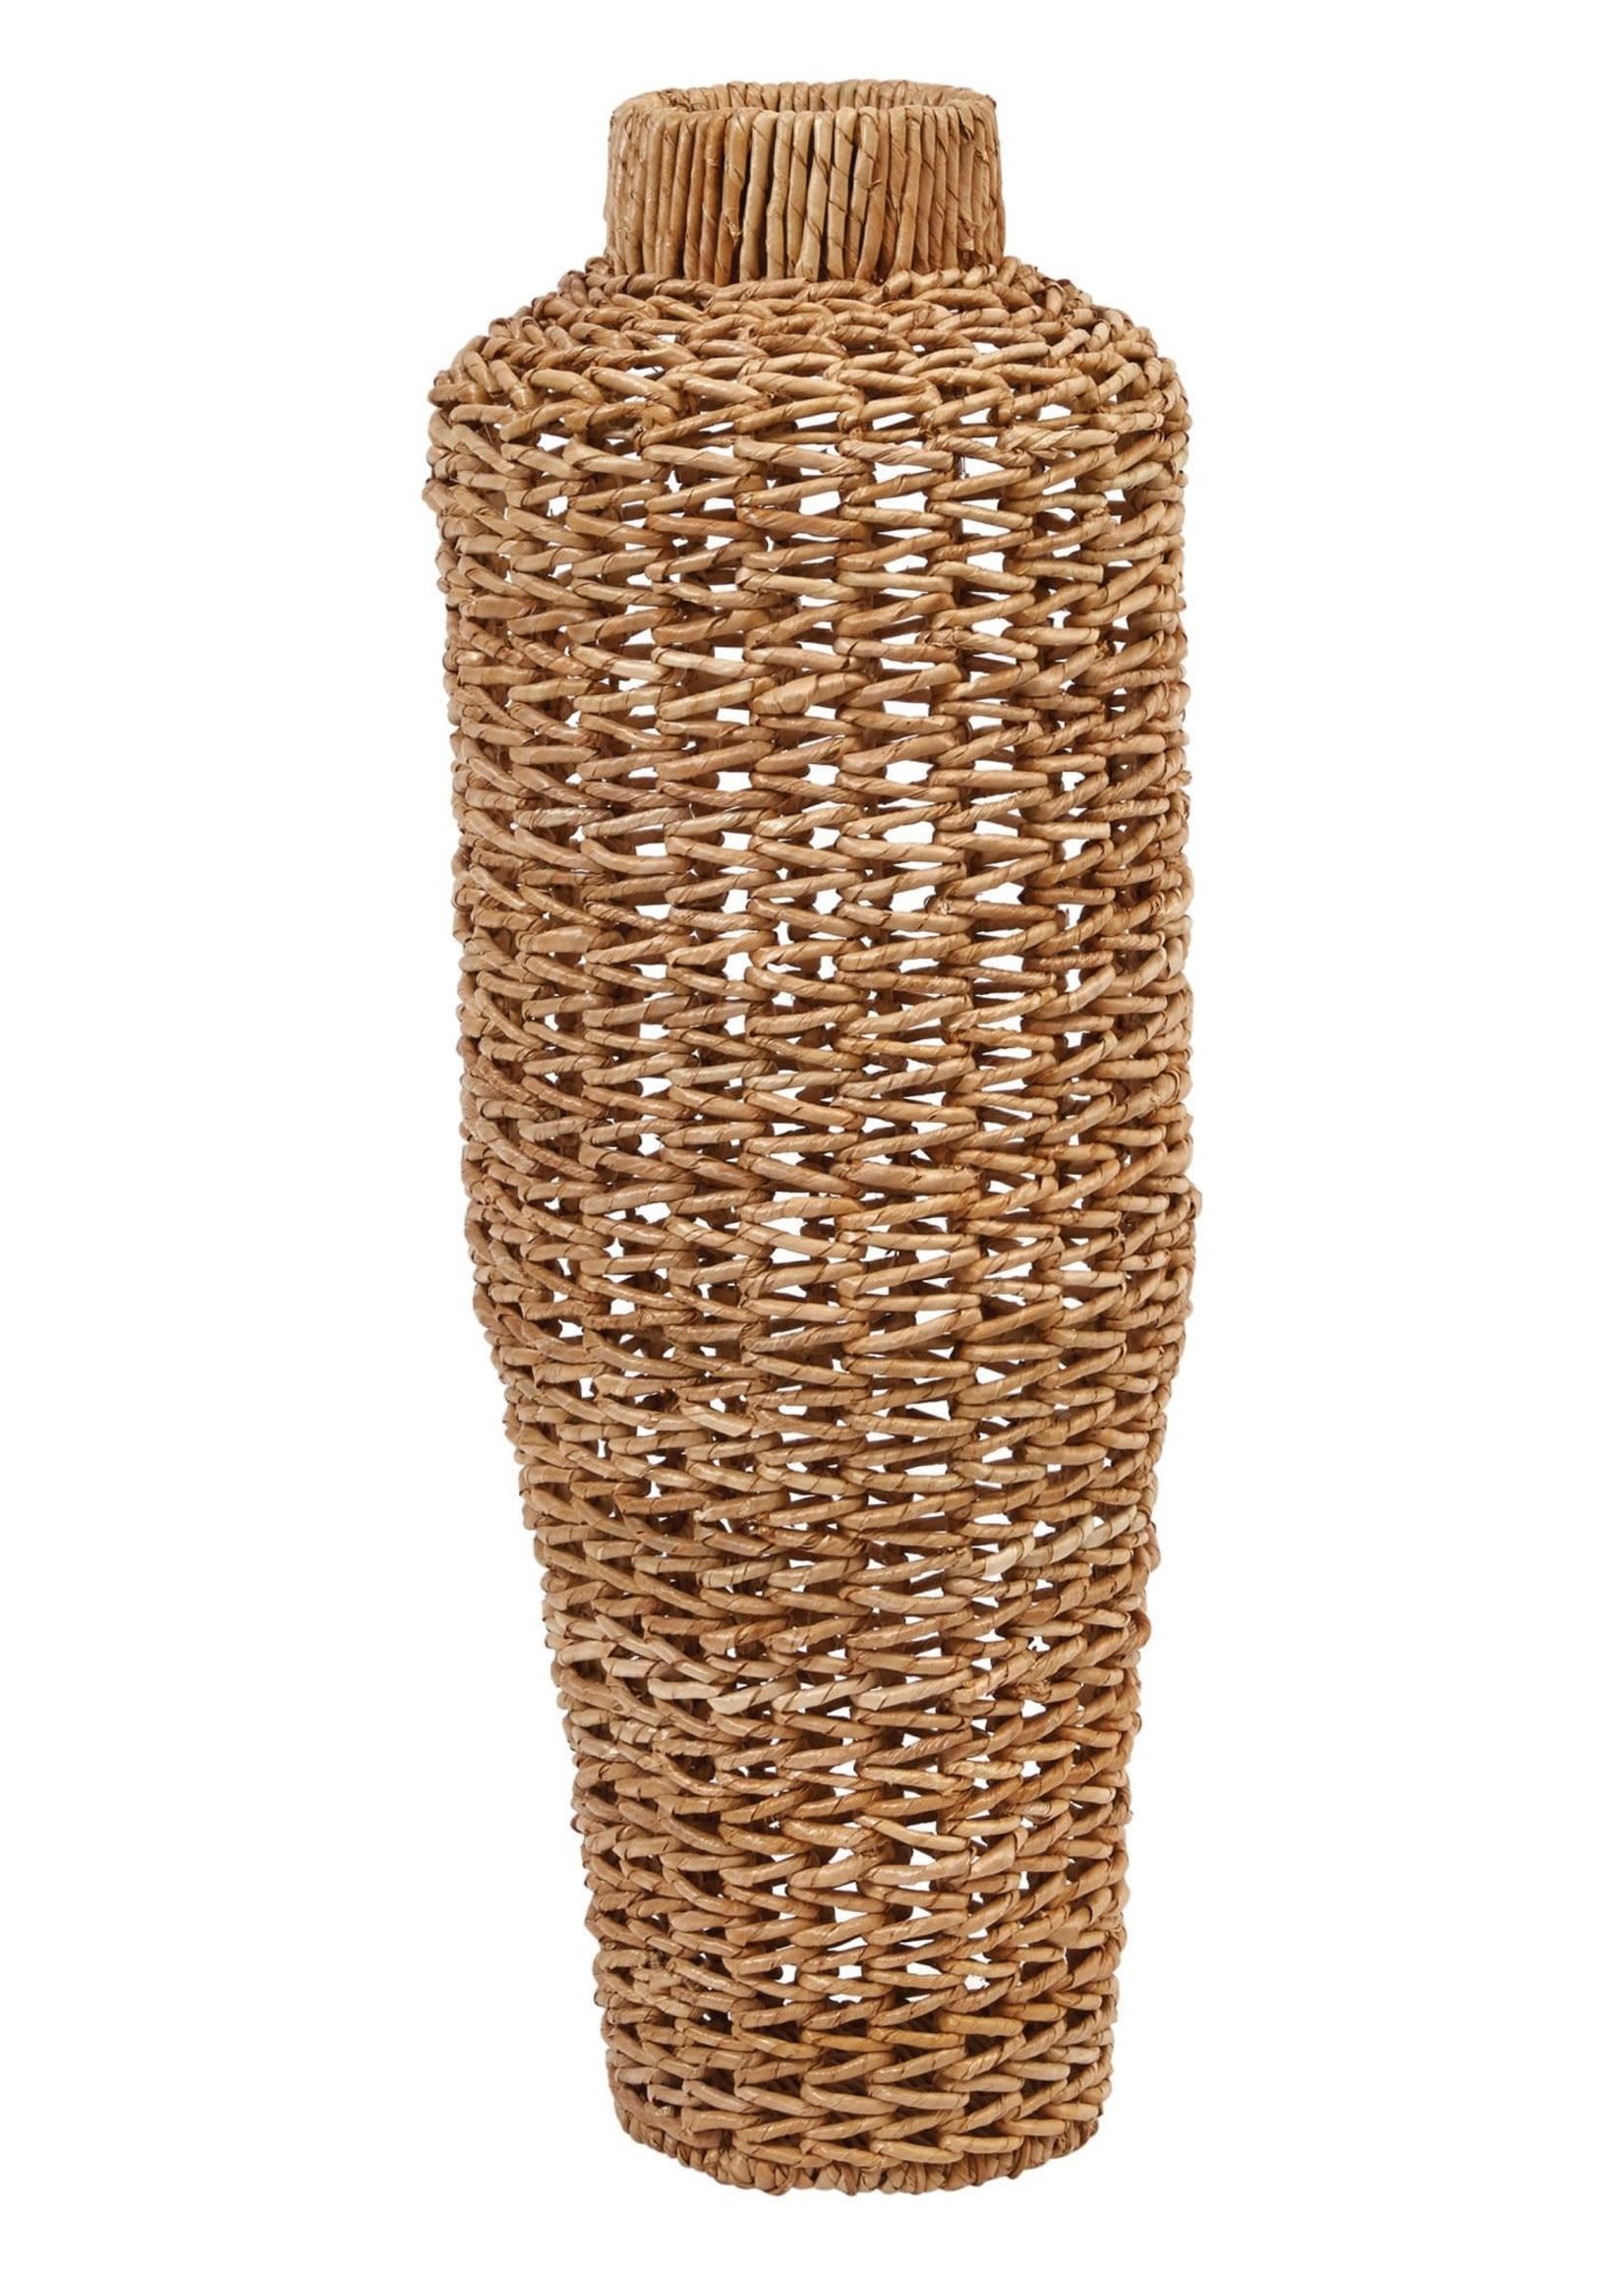 Hand-Woven Water Hyacinth & Rattan Floor Vase